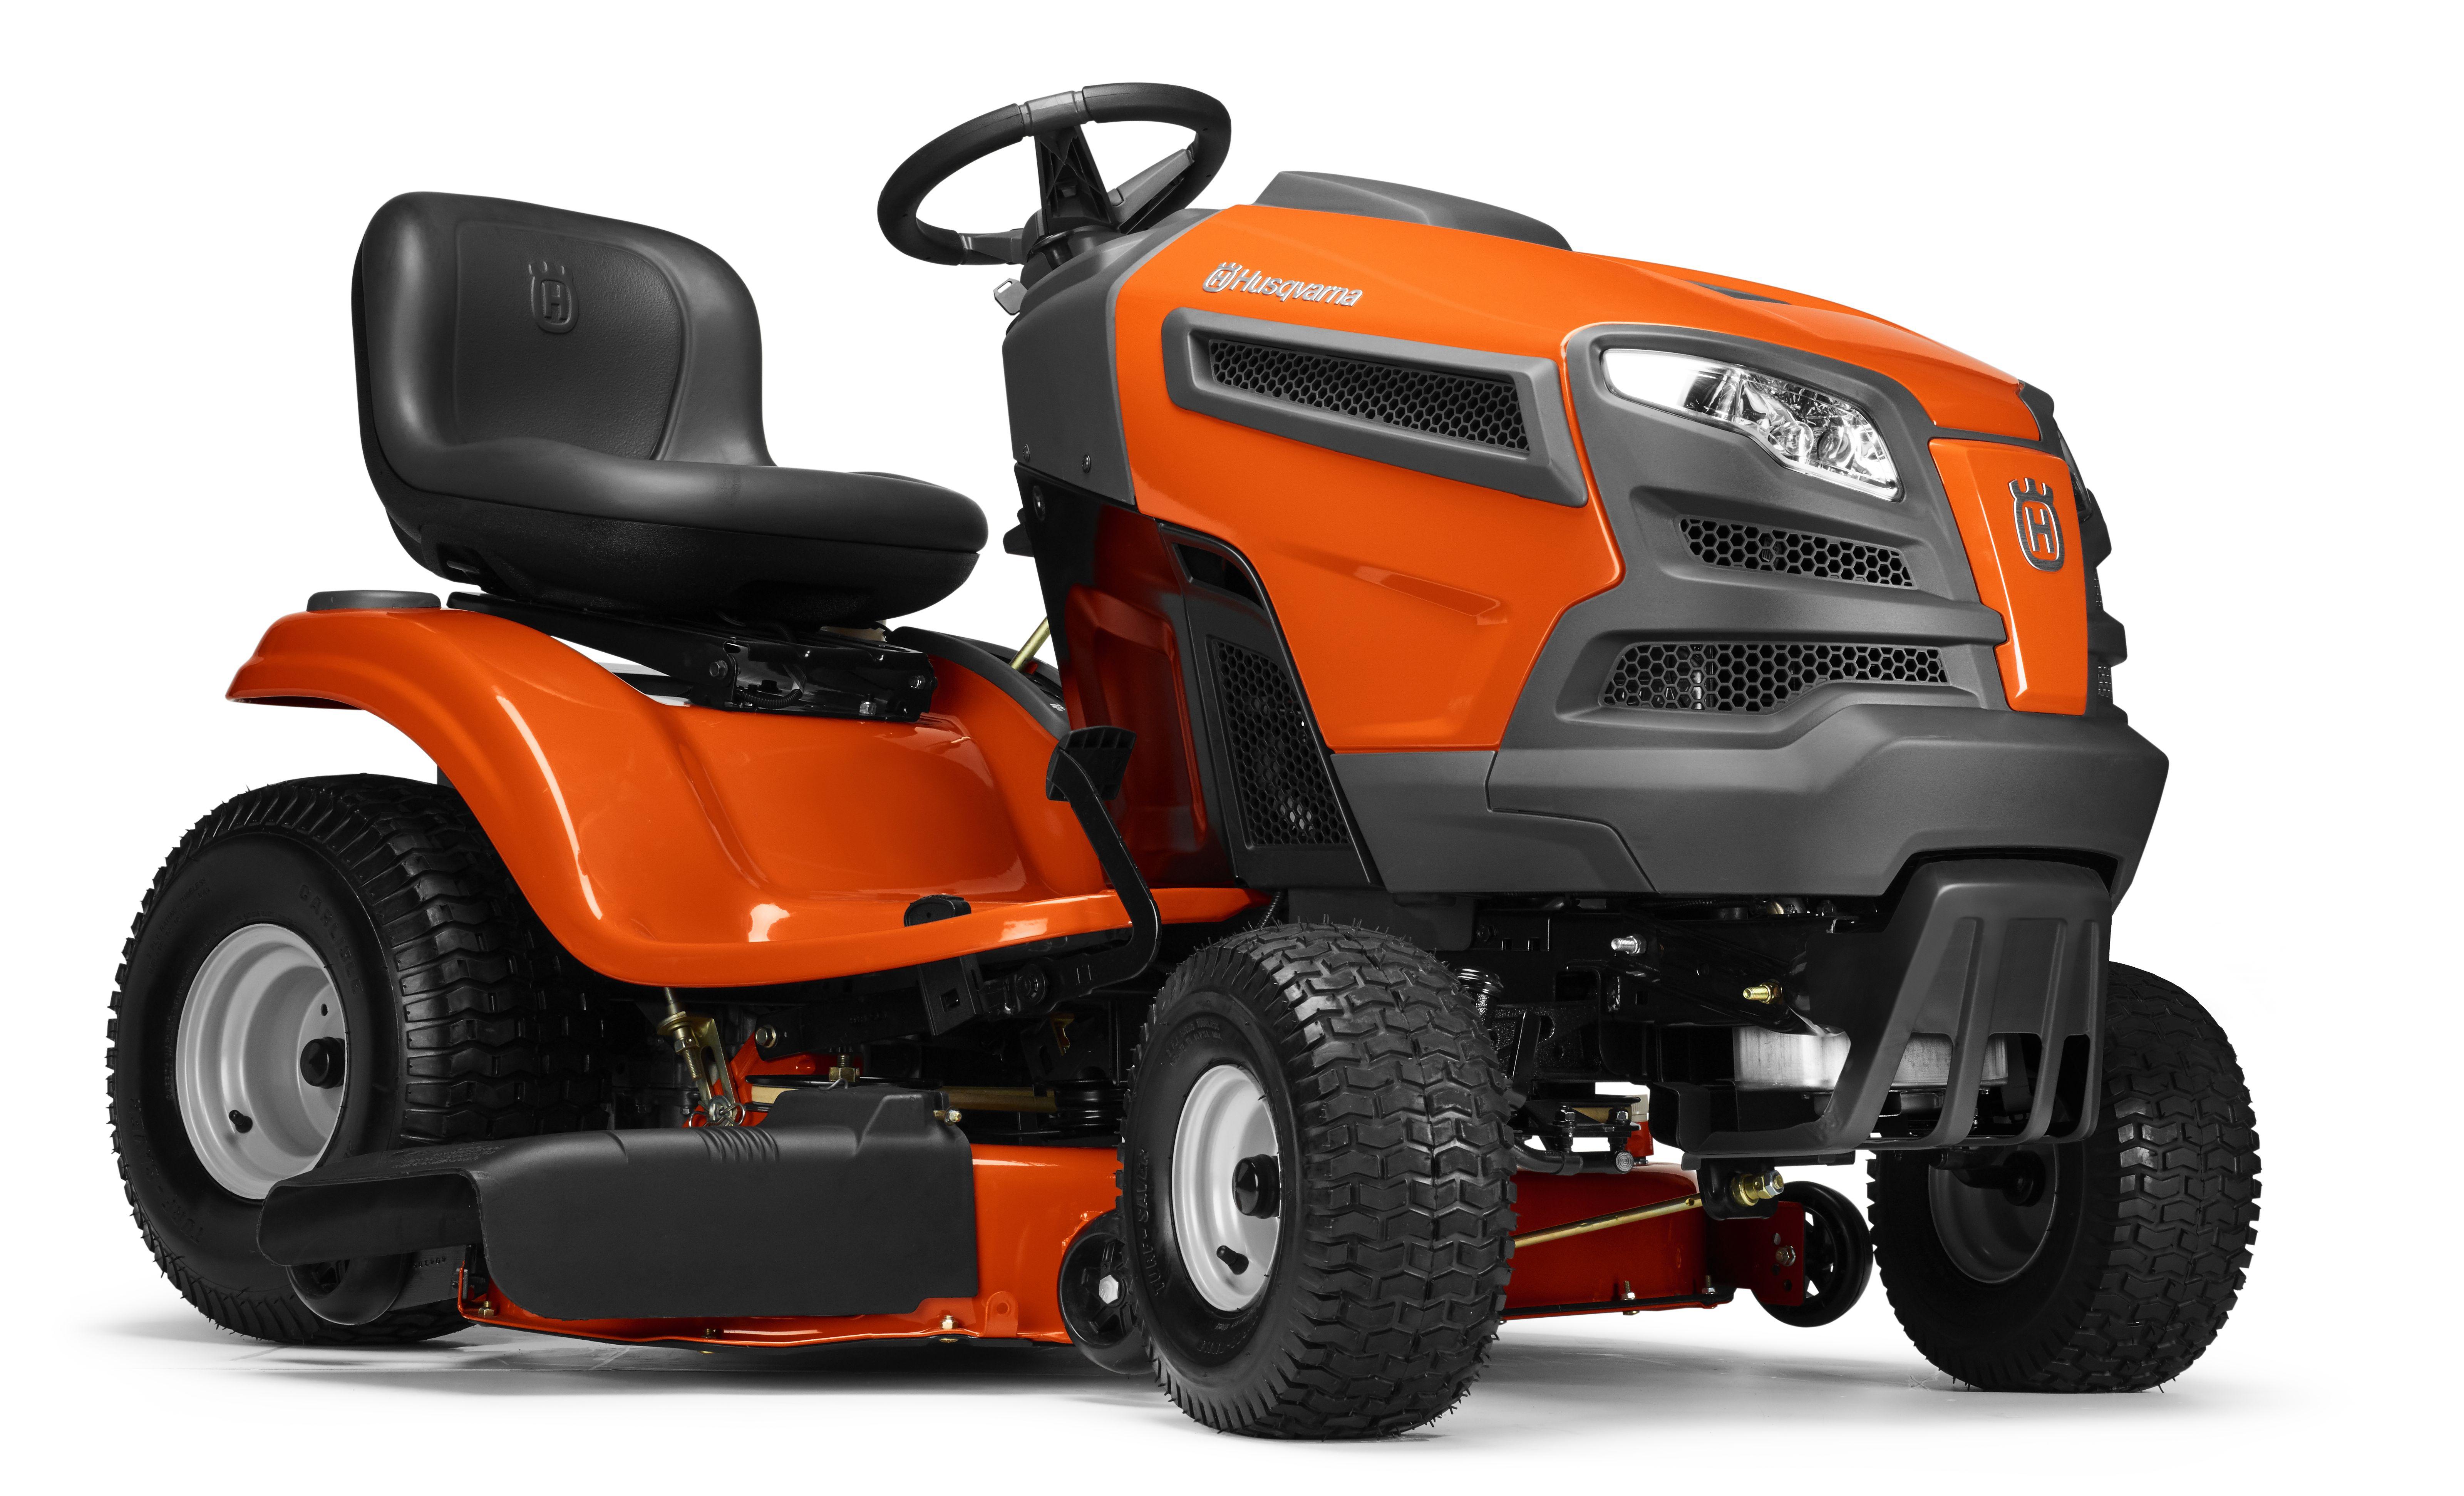 Husky Mower Wiring Harness Kit Diagram Library Easy Rider Lawn Tractors Zero Turn Radiushusky 5